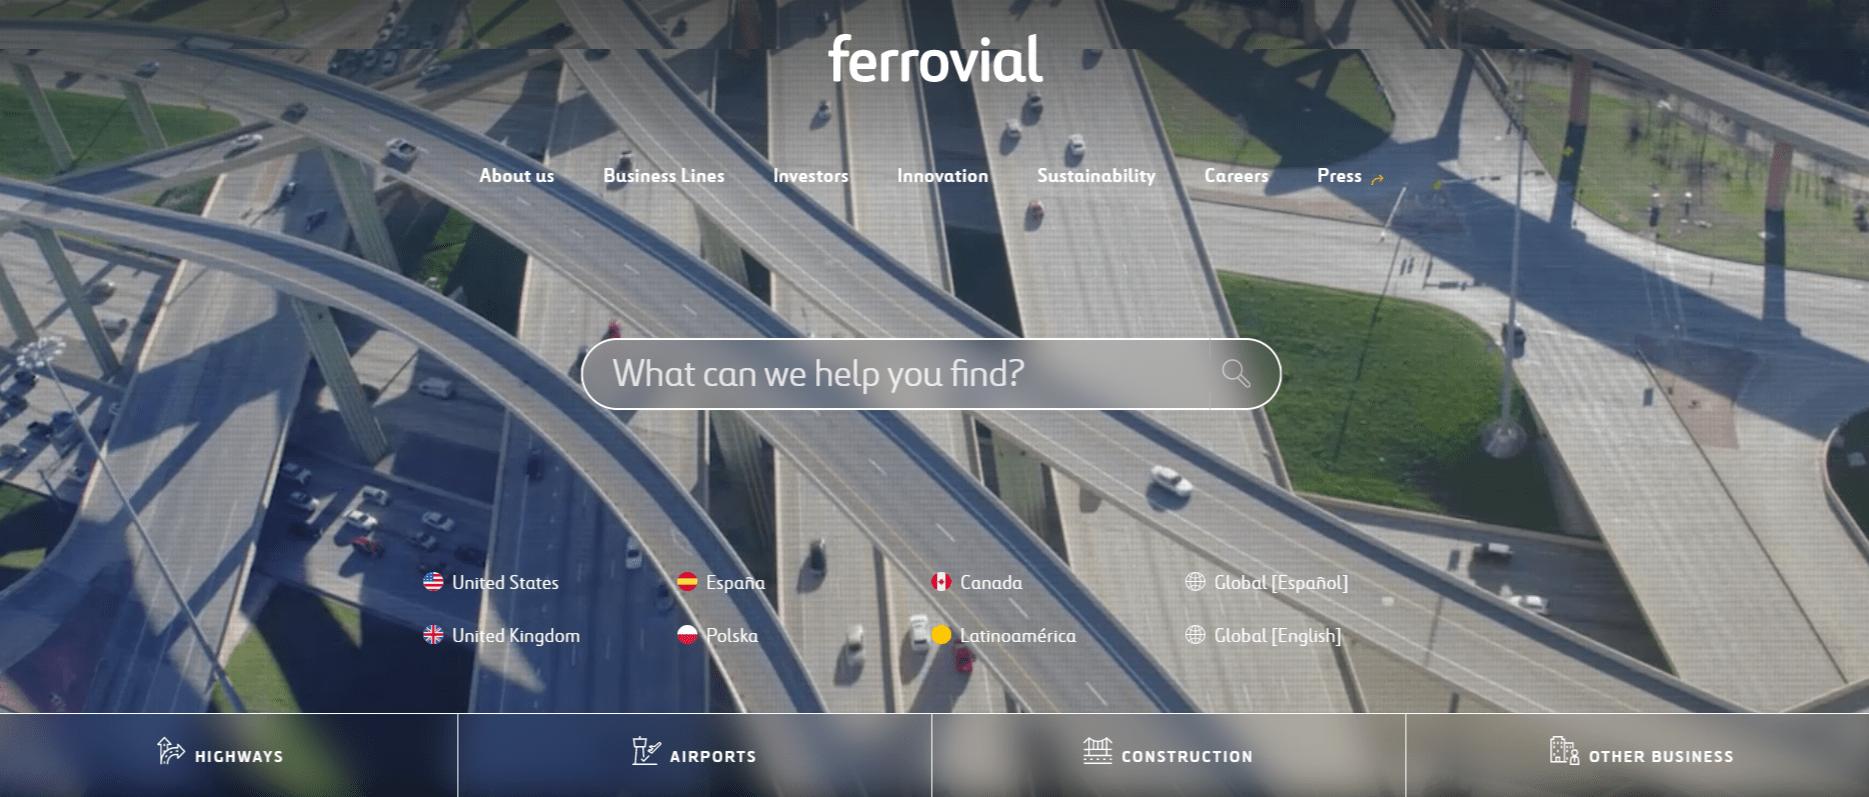 Ferrovial Global Website